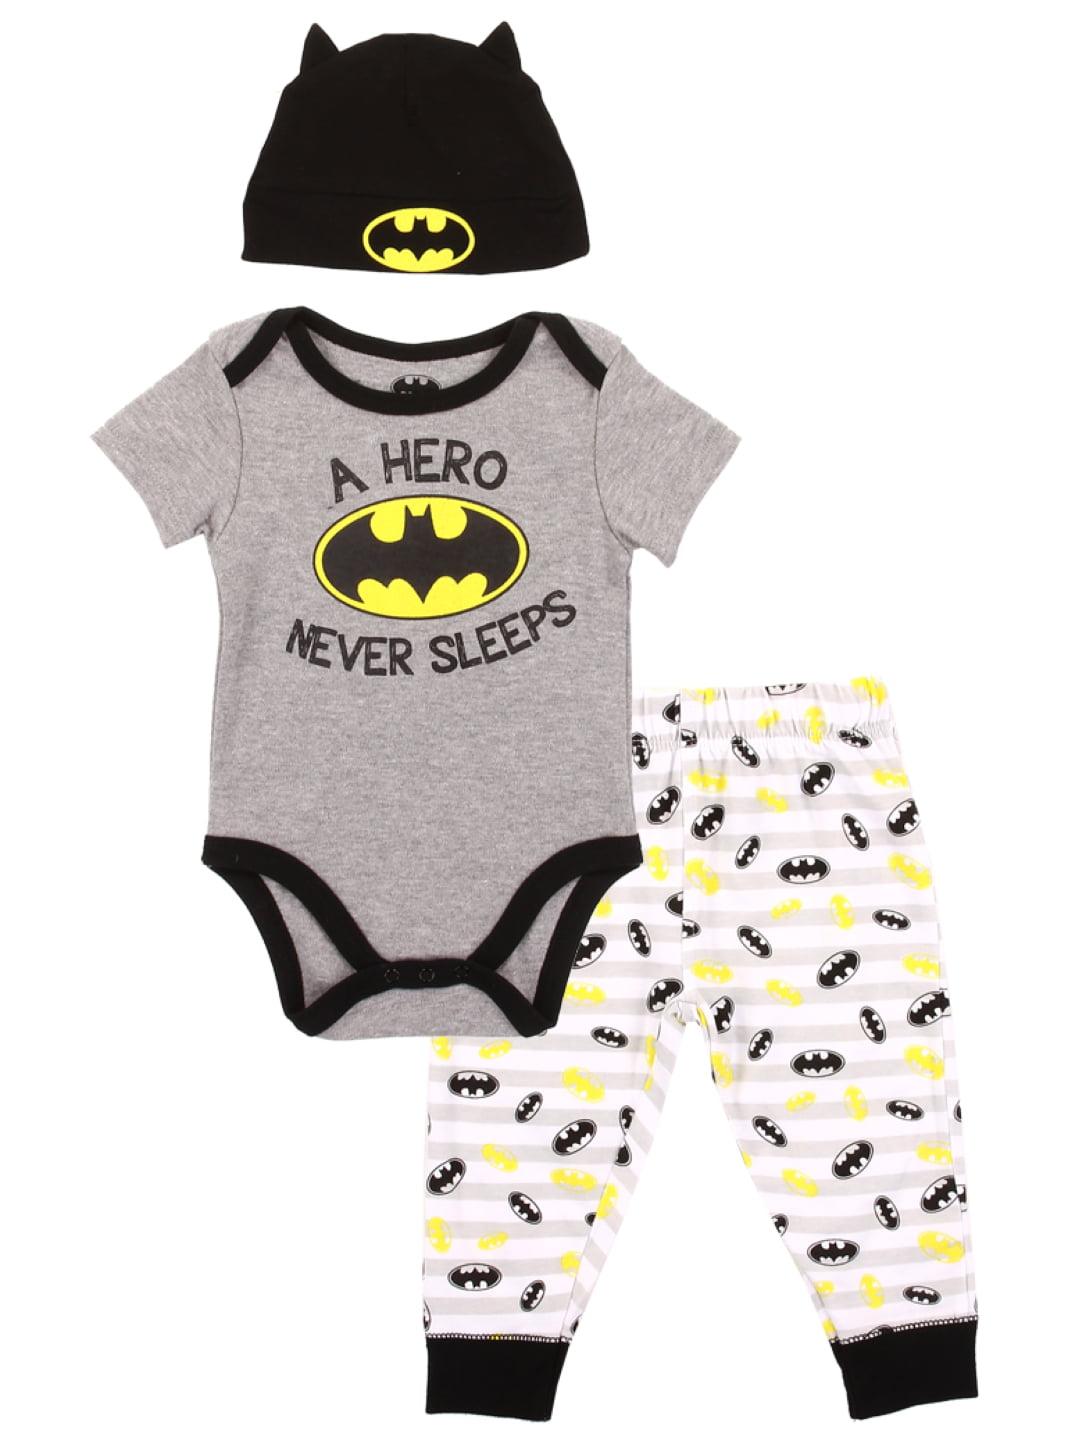 Superman Captain America Infant Superhero Creeper Set Includes Batman